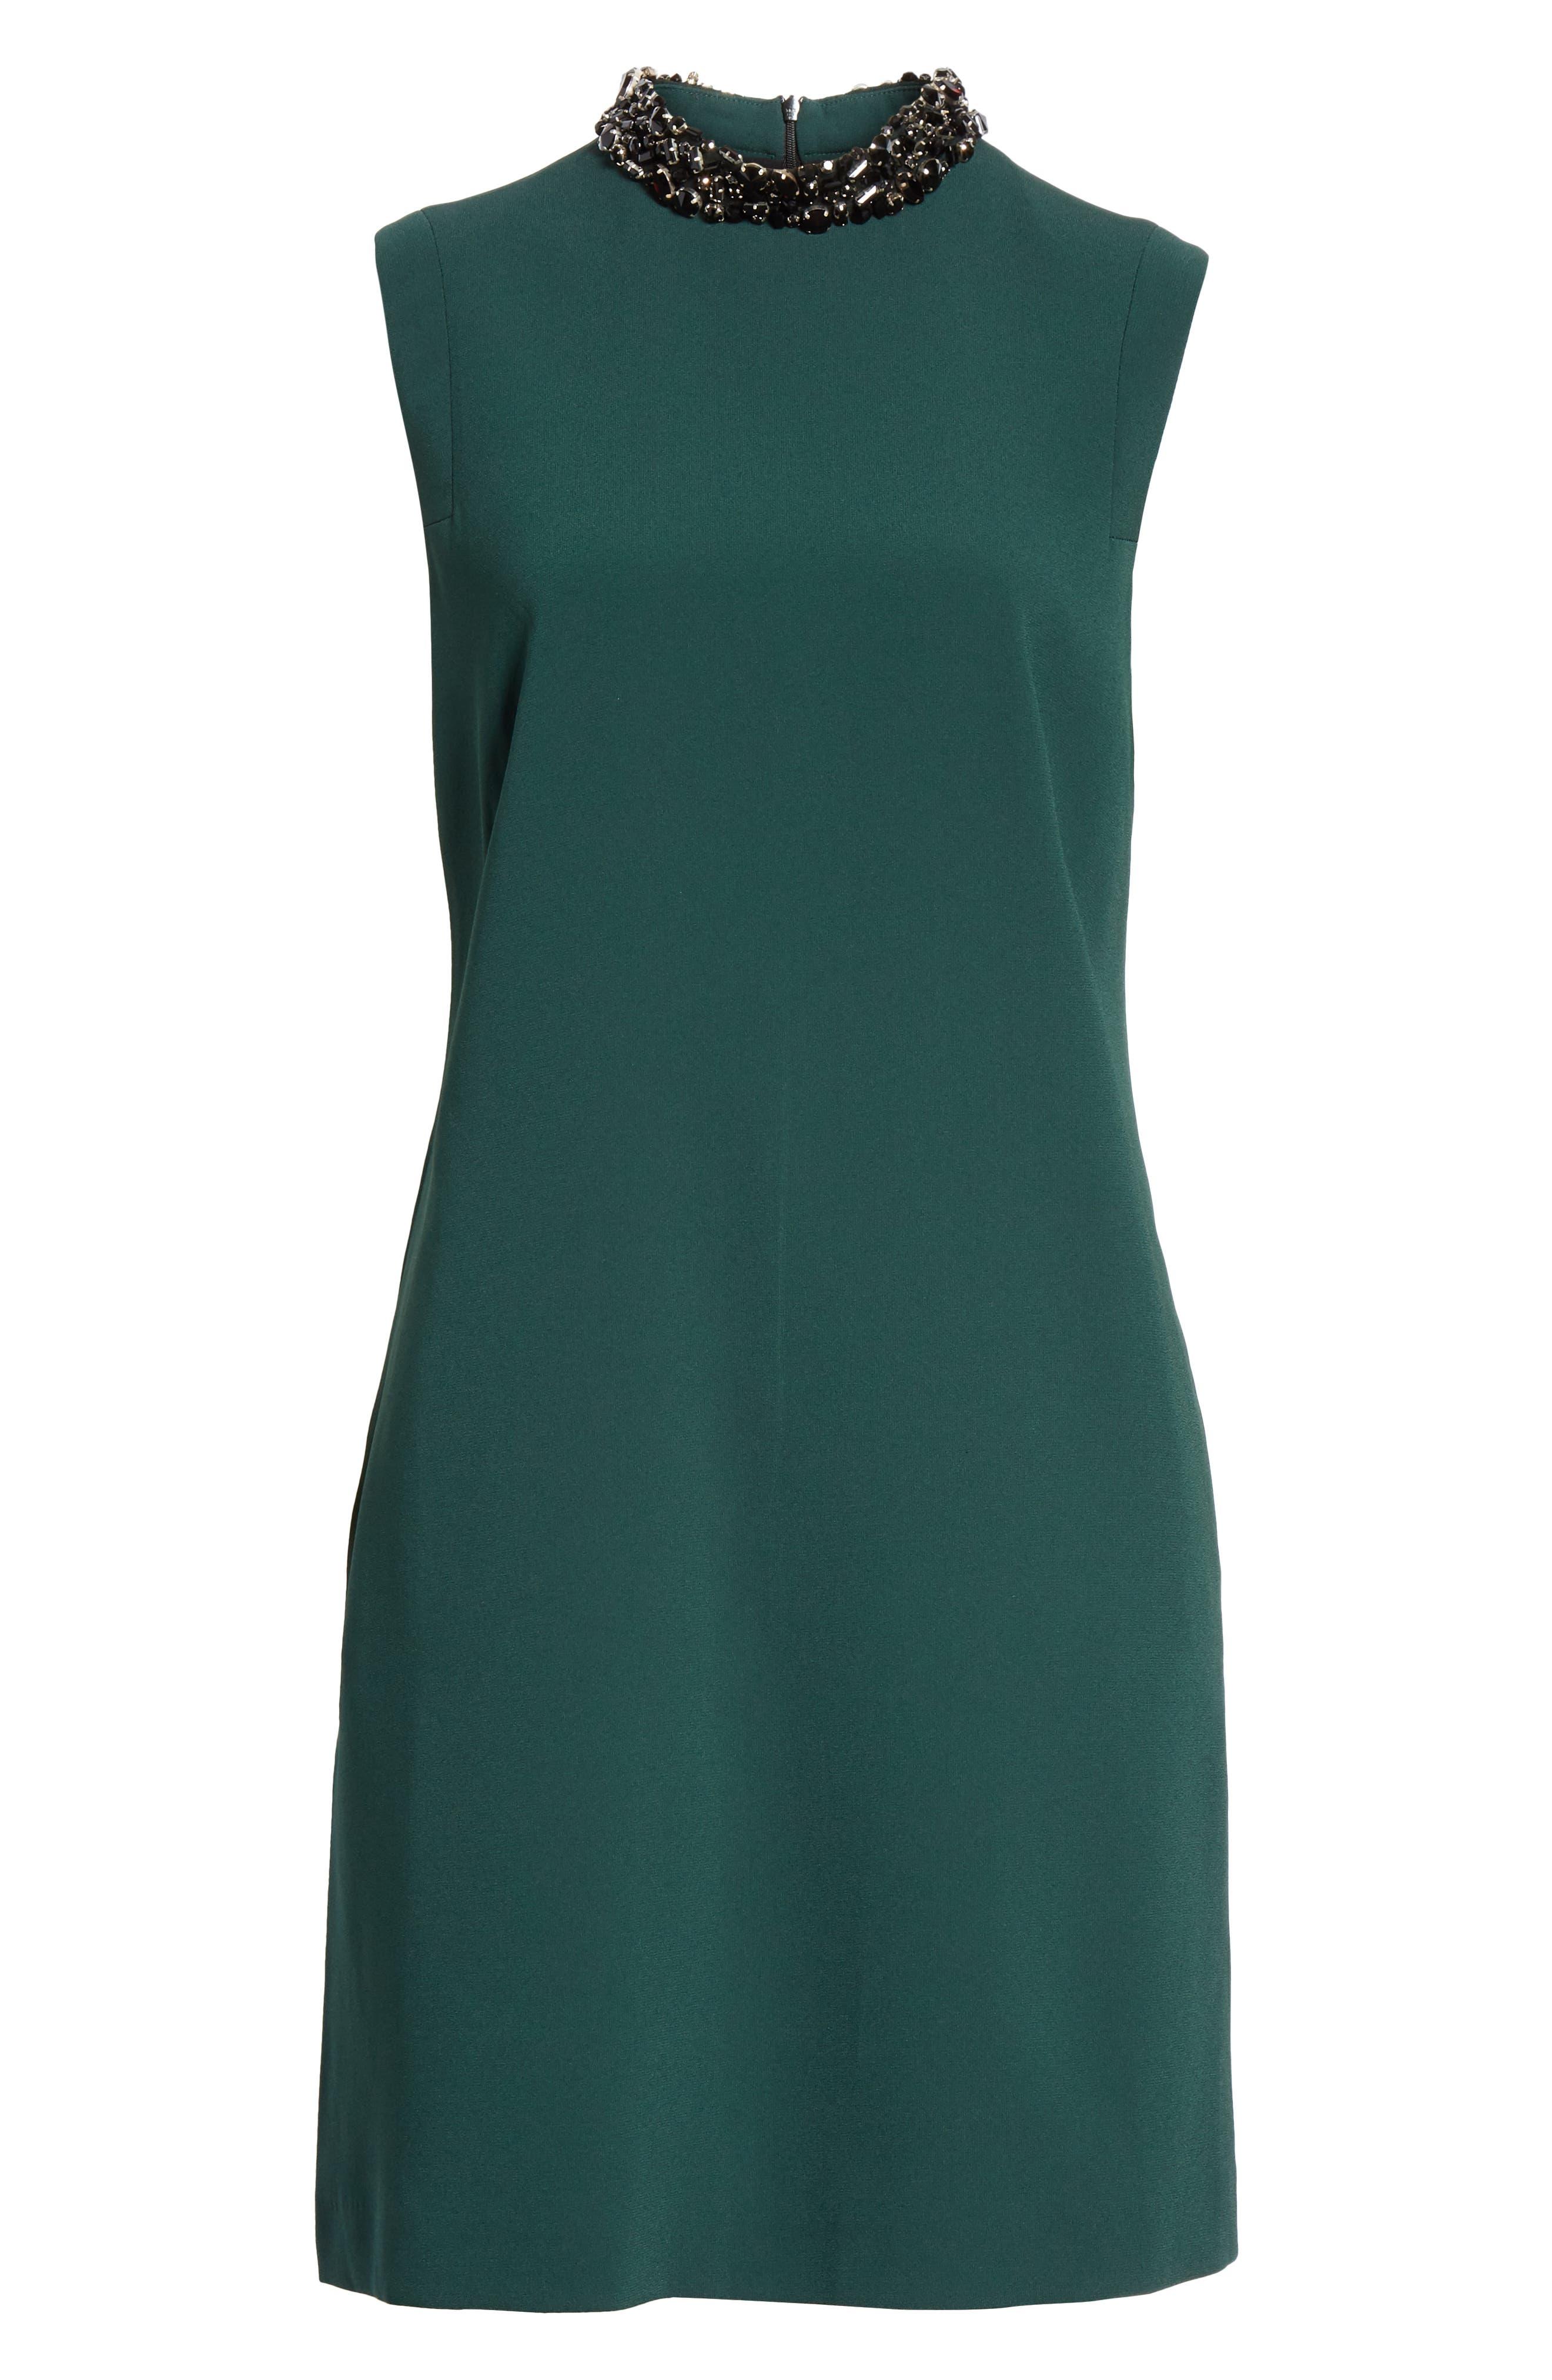 Verona Jewel Neck Dress,                             Alternate thumbnail 6, color,                             DK. GREEN